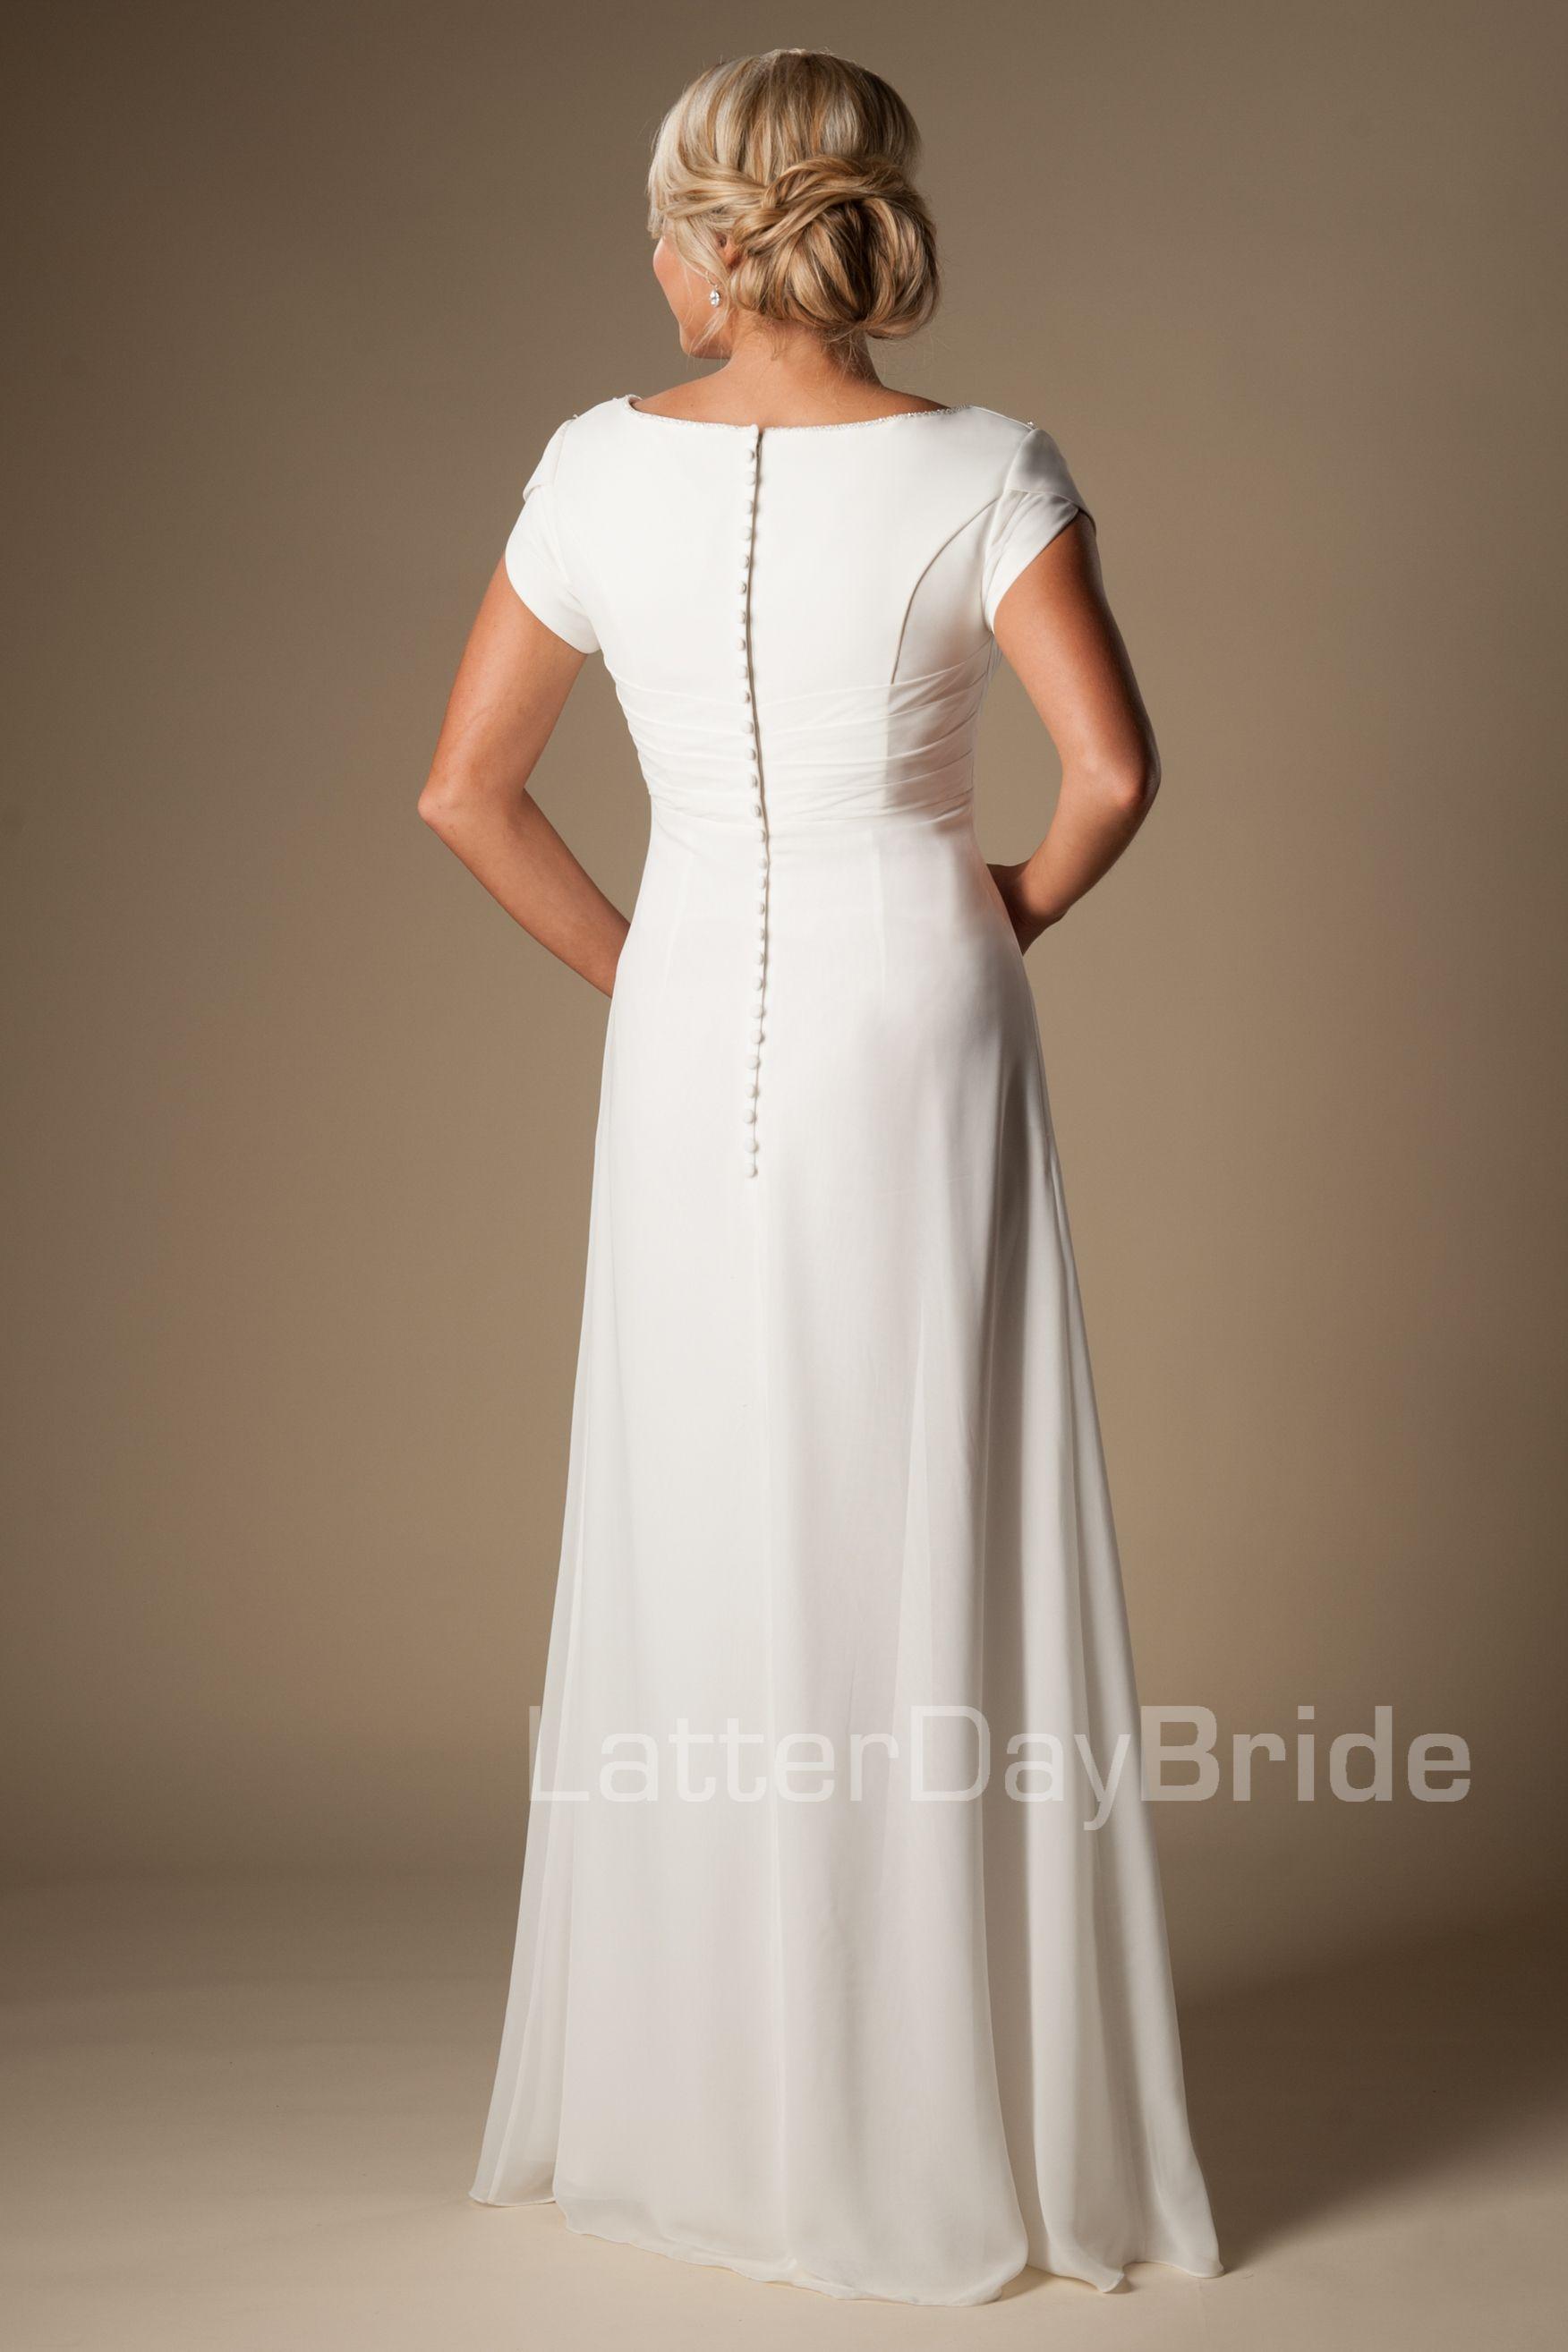 modest-wedding-dress-anderson-back.jpg